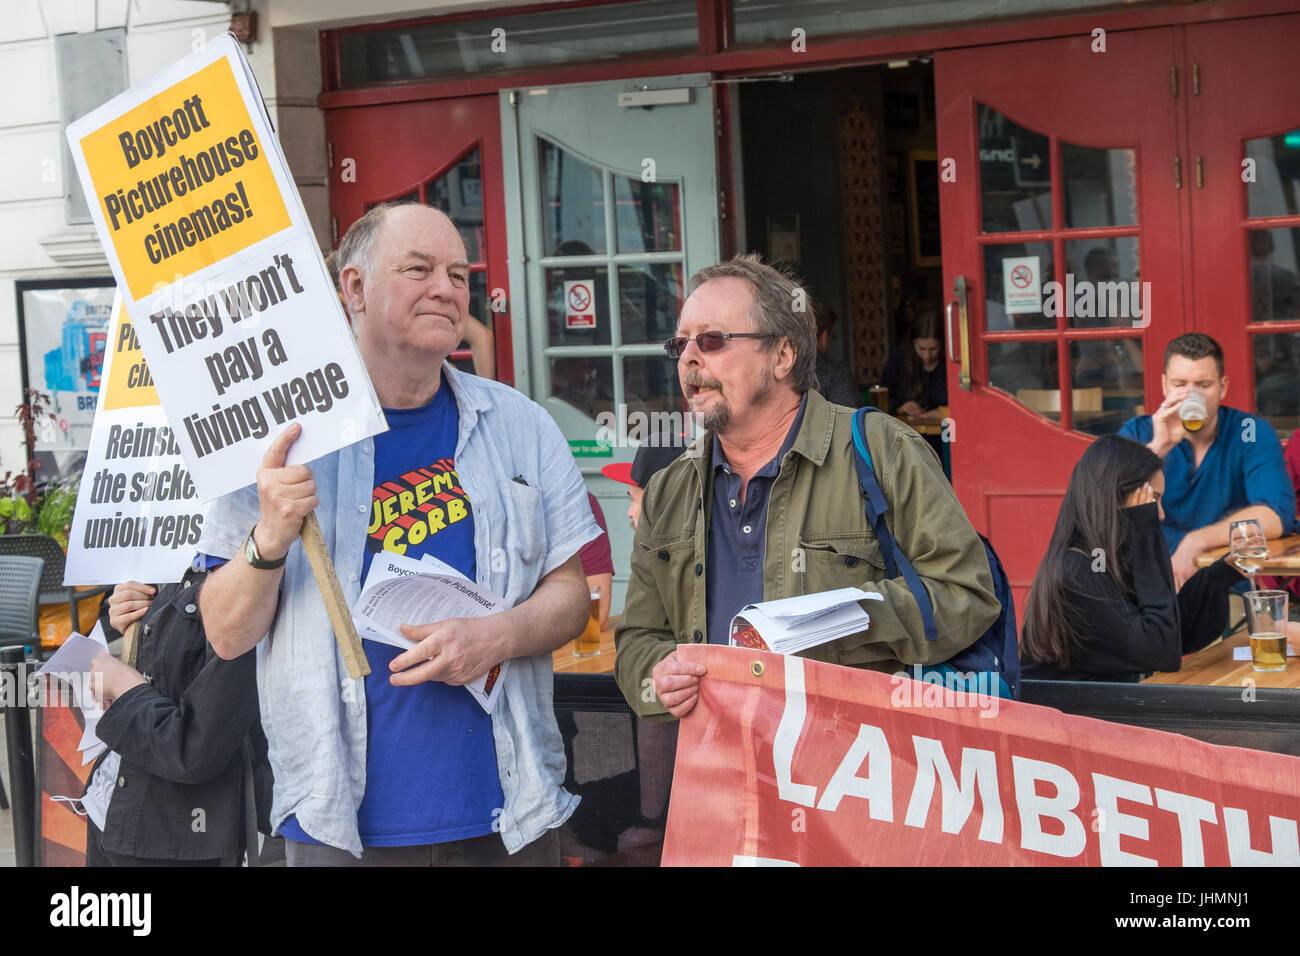 July 14, 2017 - London, UK - London, UK. 14th July 2017. A community protestby local cinema-goers outside Brixton's Stock Photo